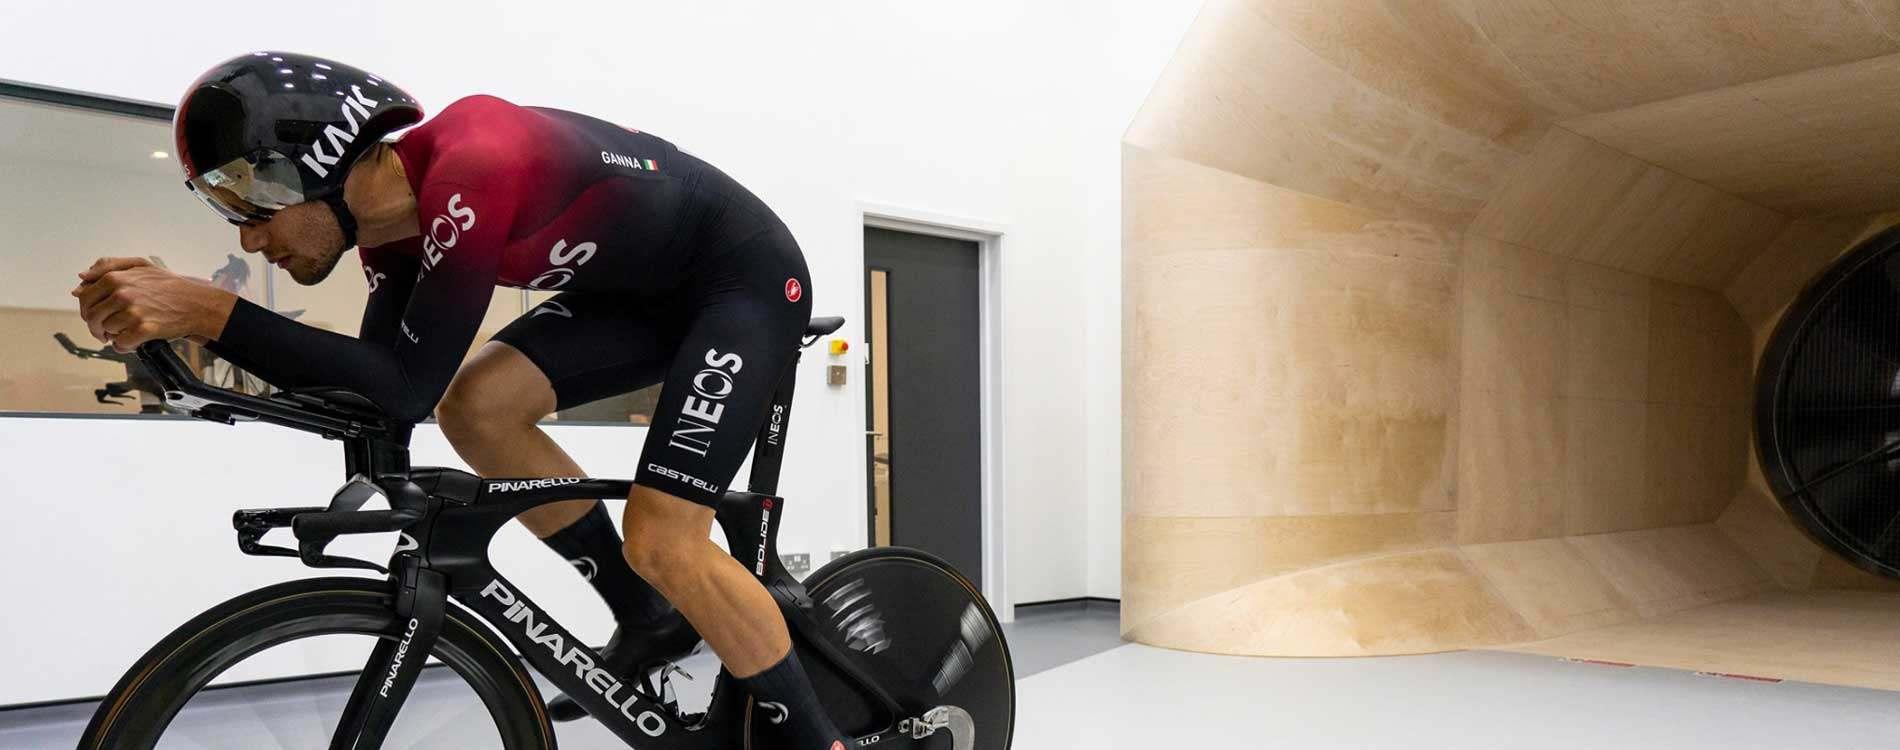 2019 Team Ineos Cycling Kit!